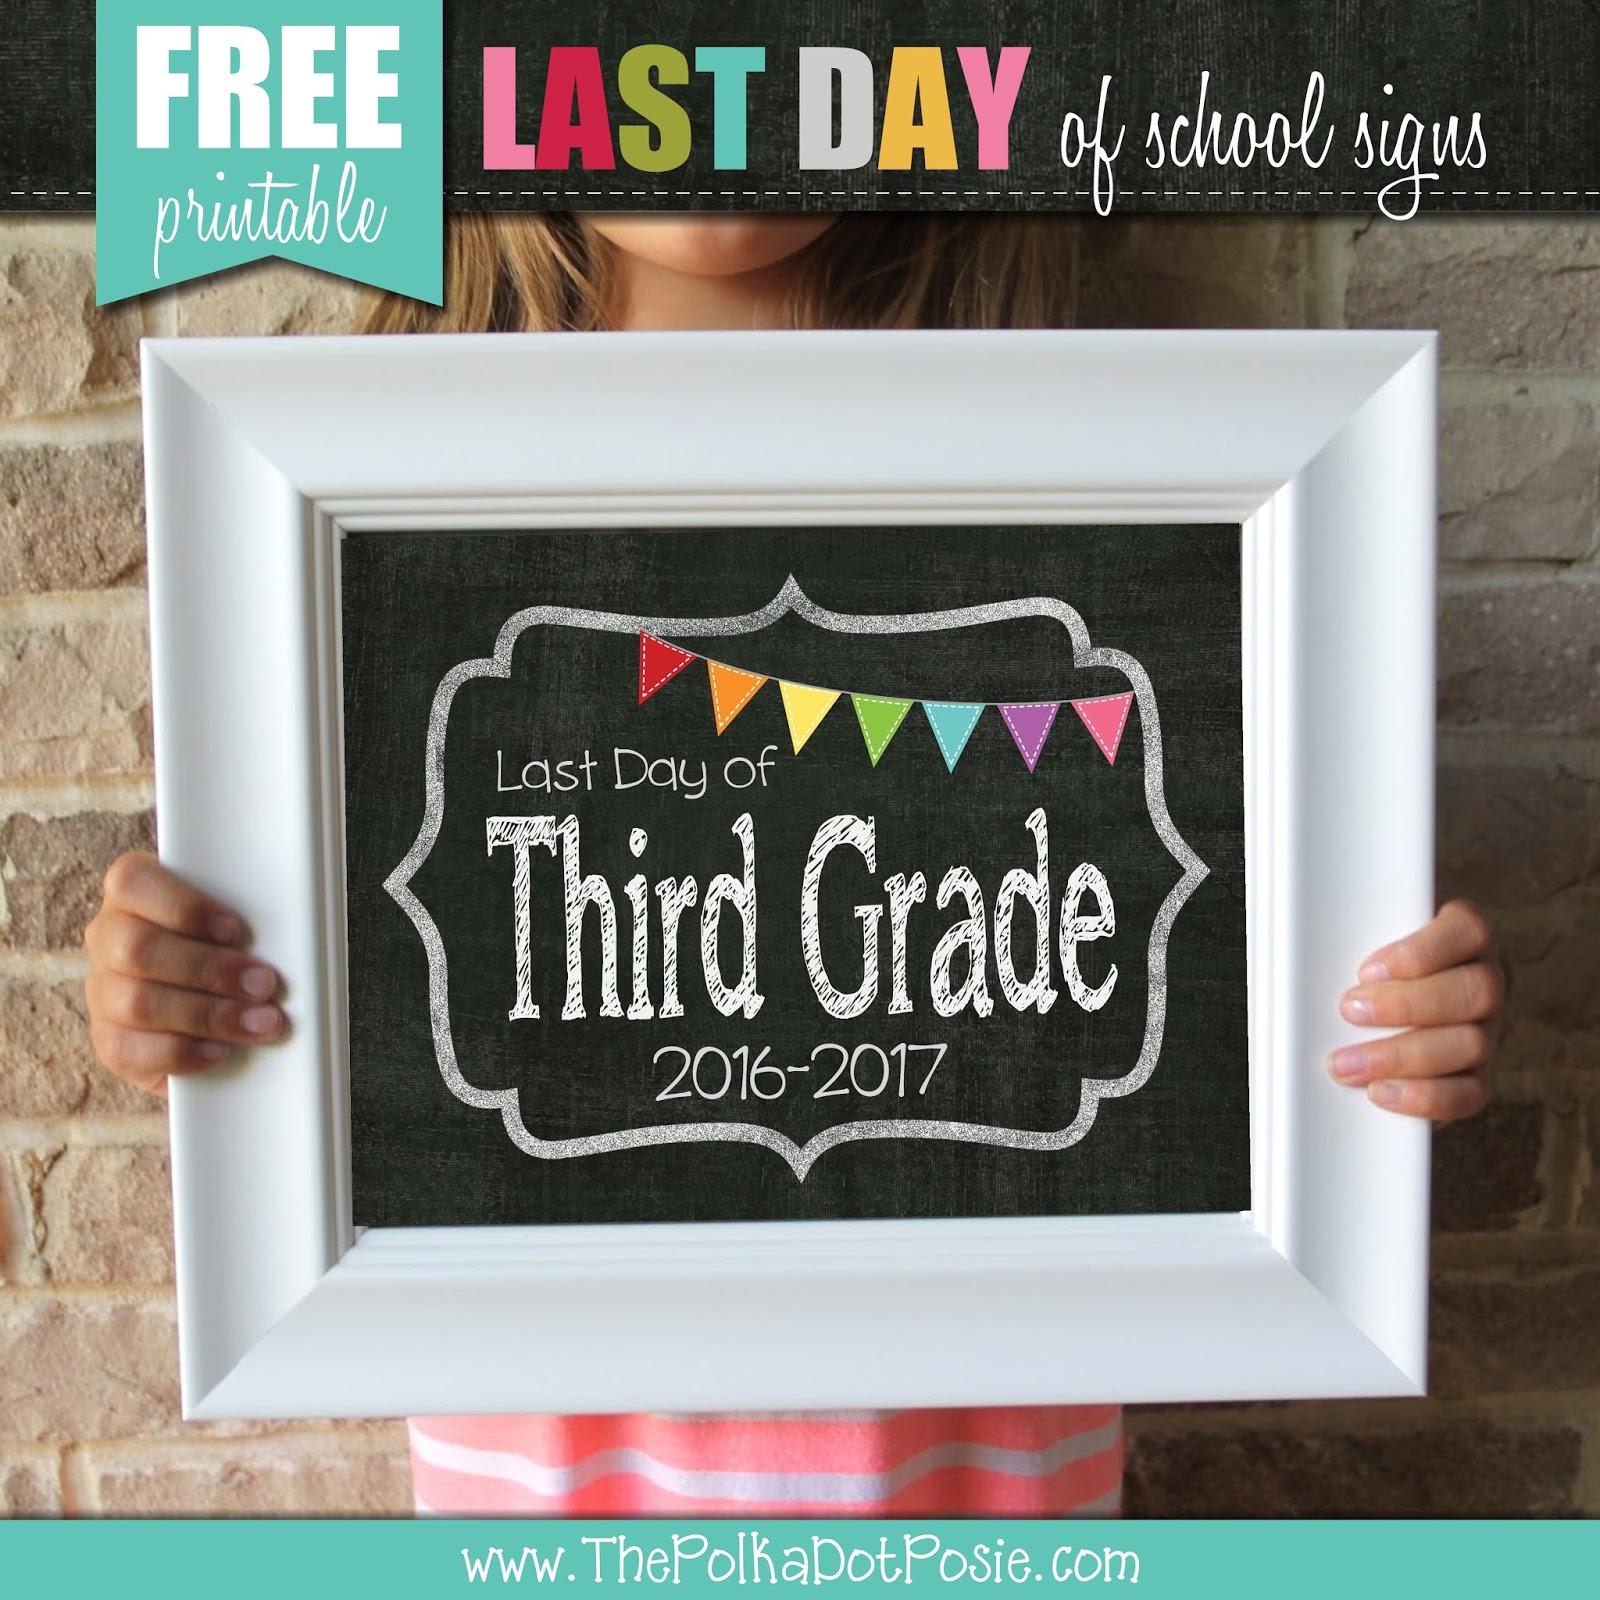 The Polka Dot Posie Free Printable Last Day Of School Signs